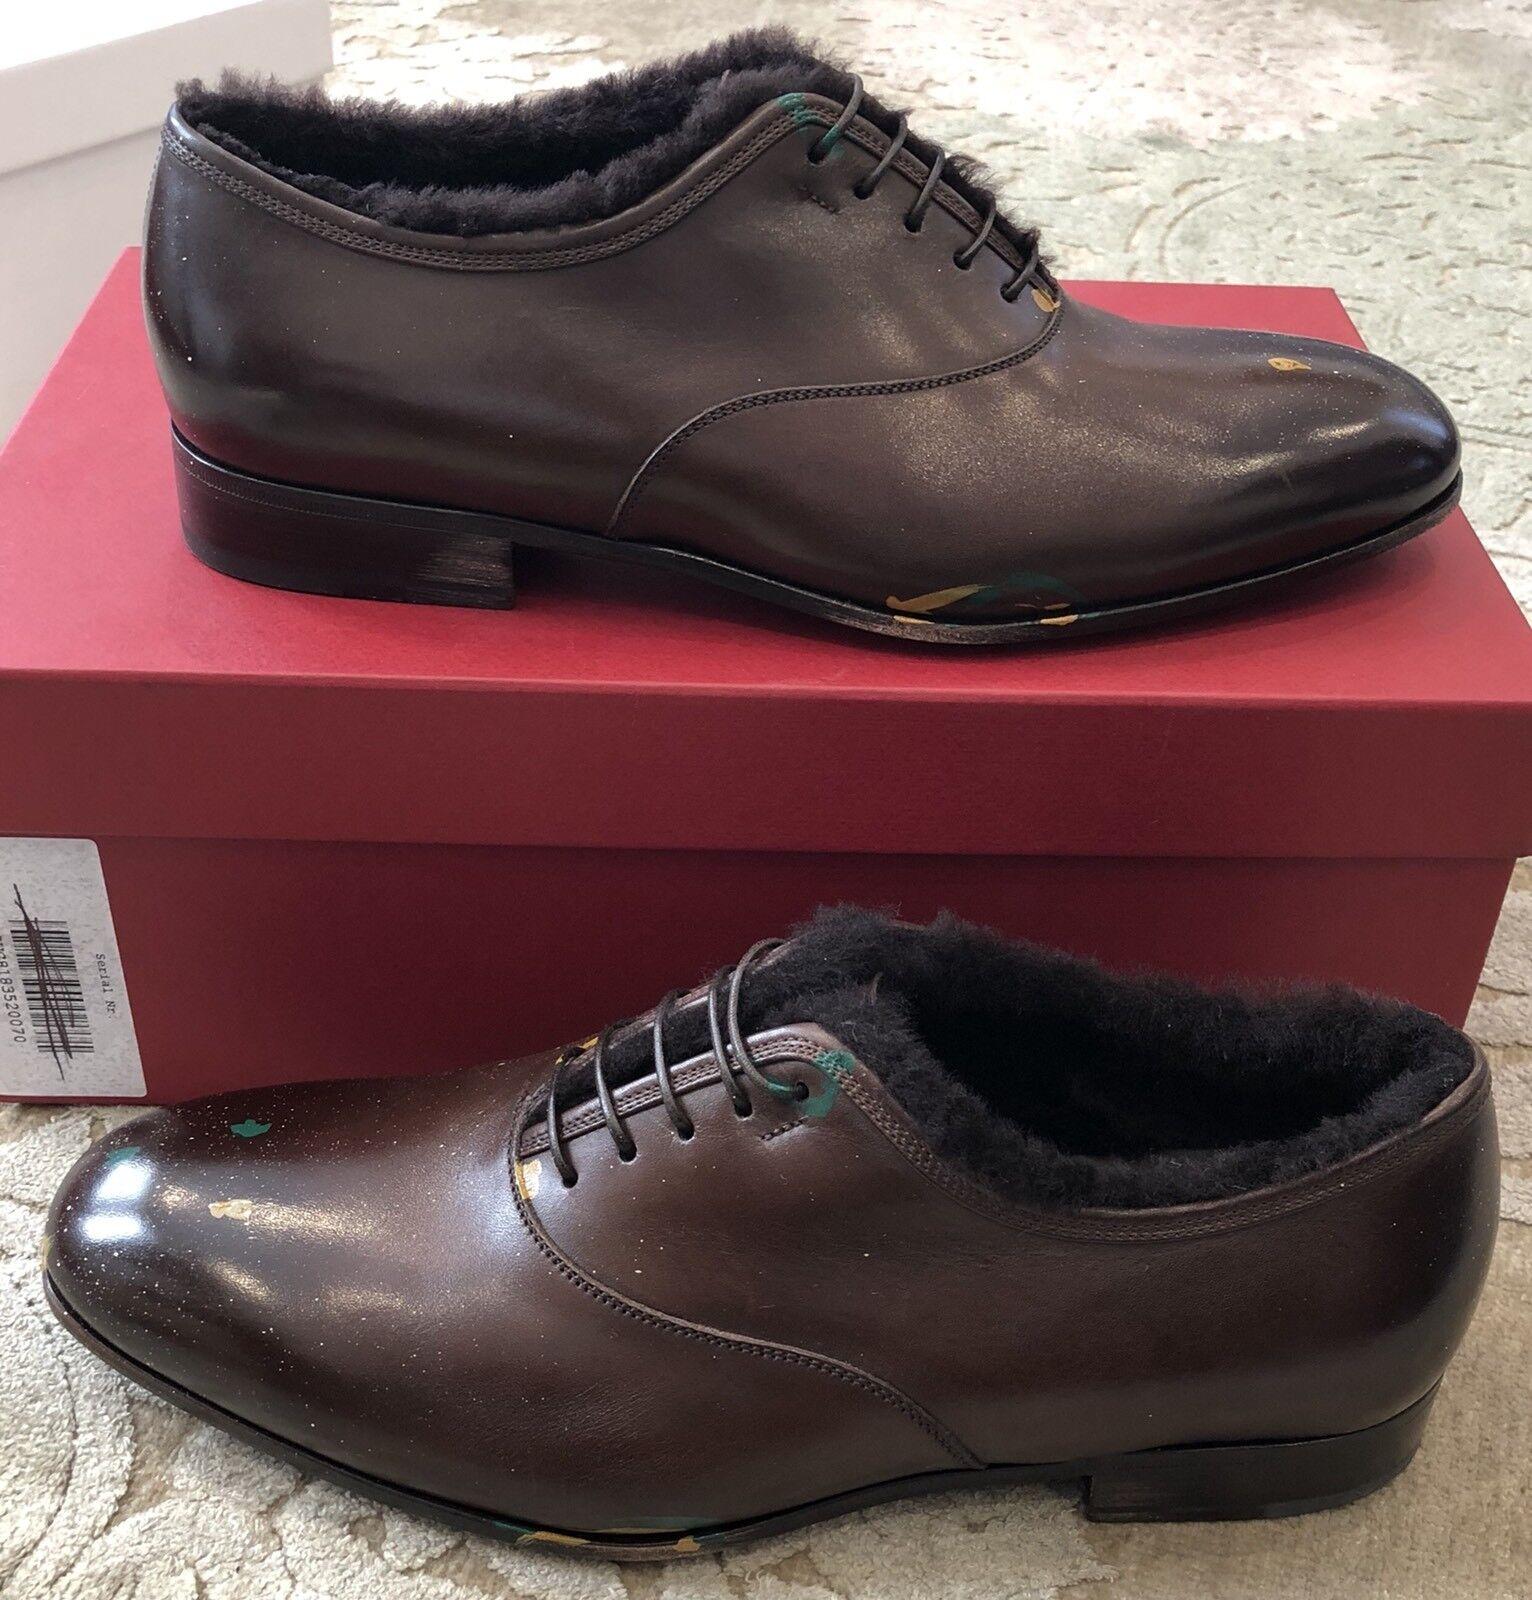 93b033803ceb 750 750 750 New Salvatore Ferragamo Mens shoes Brown Distressed Paint Size  8 US 7 UK ...